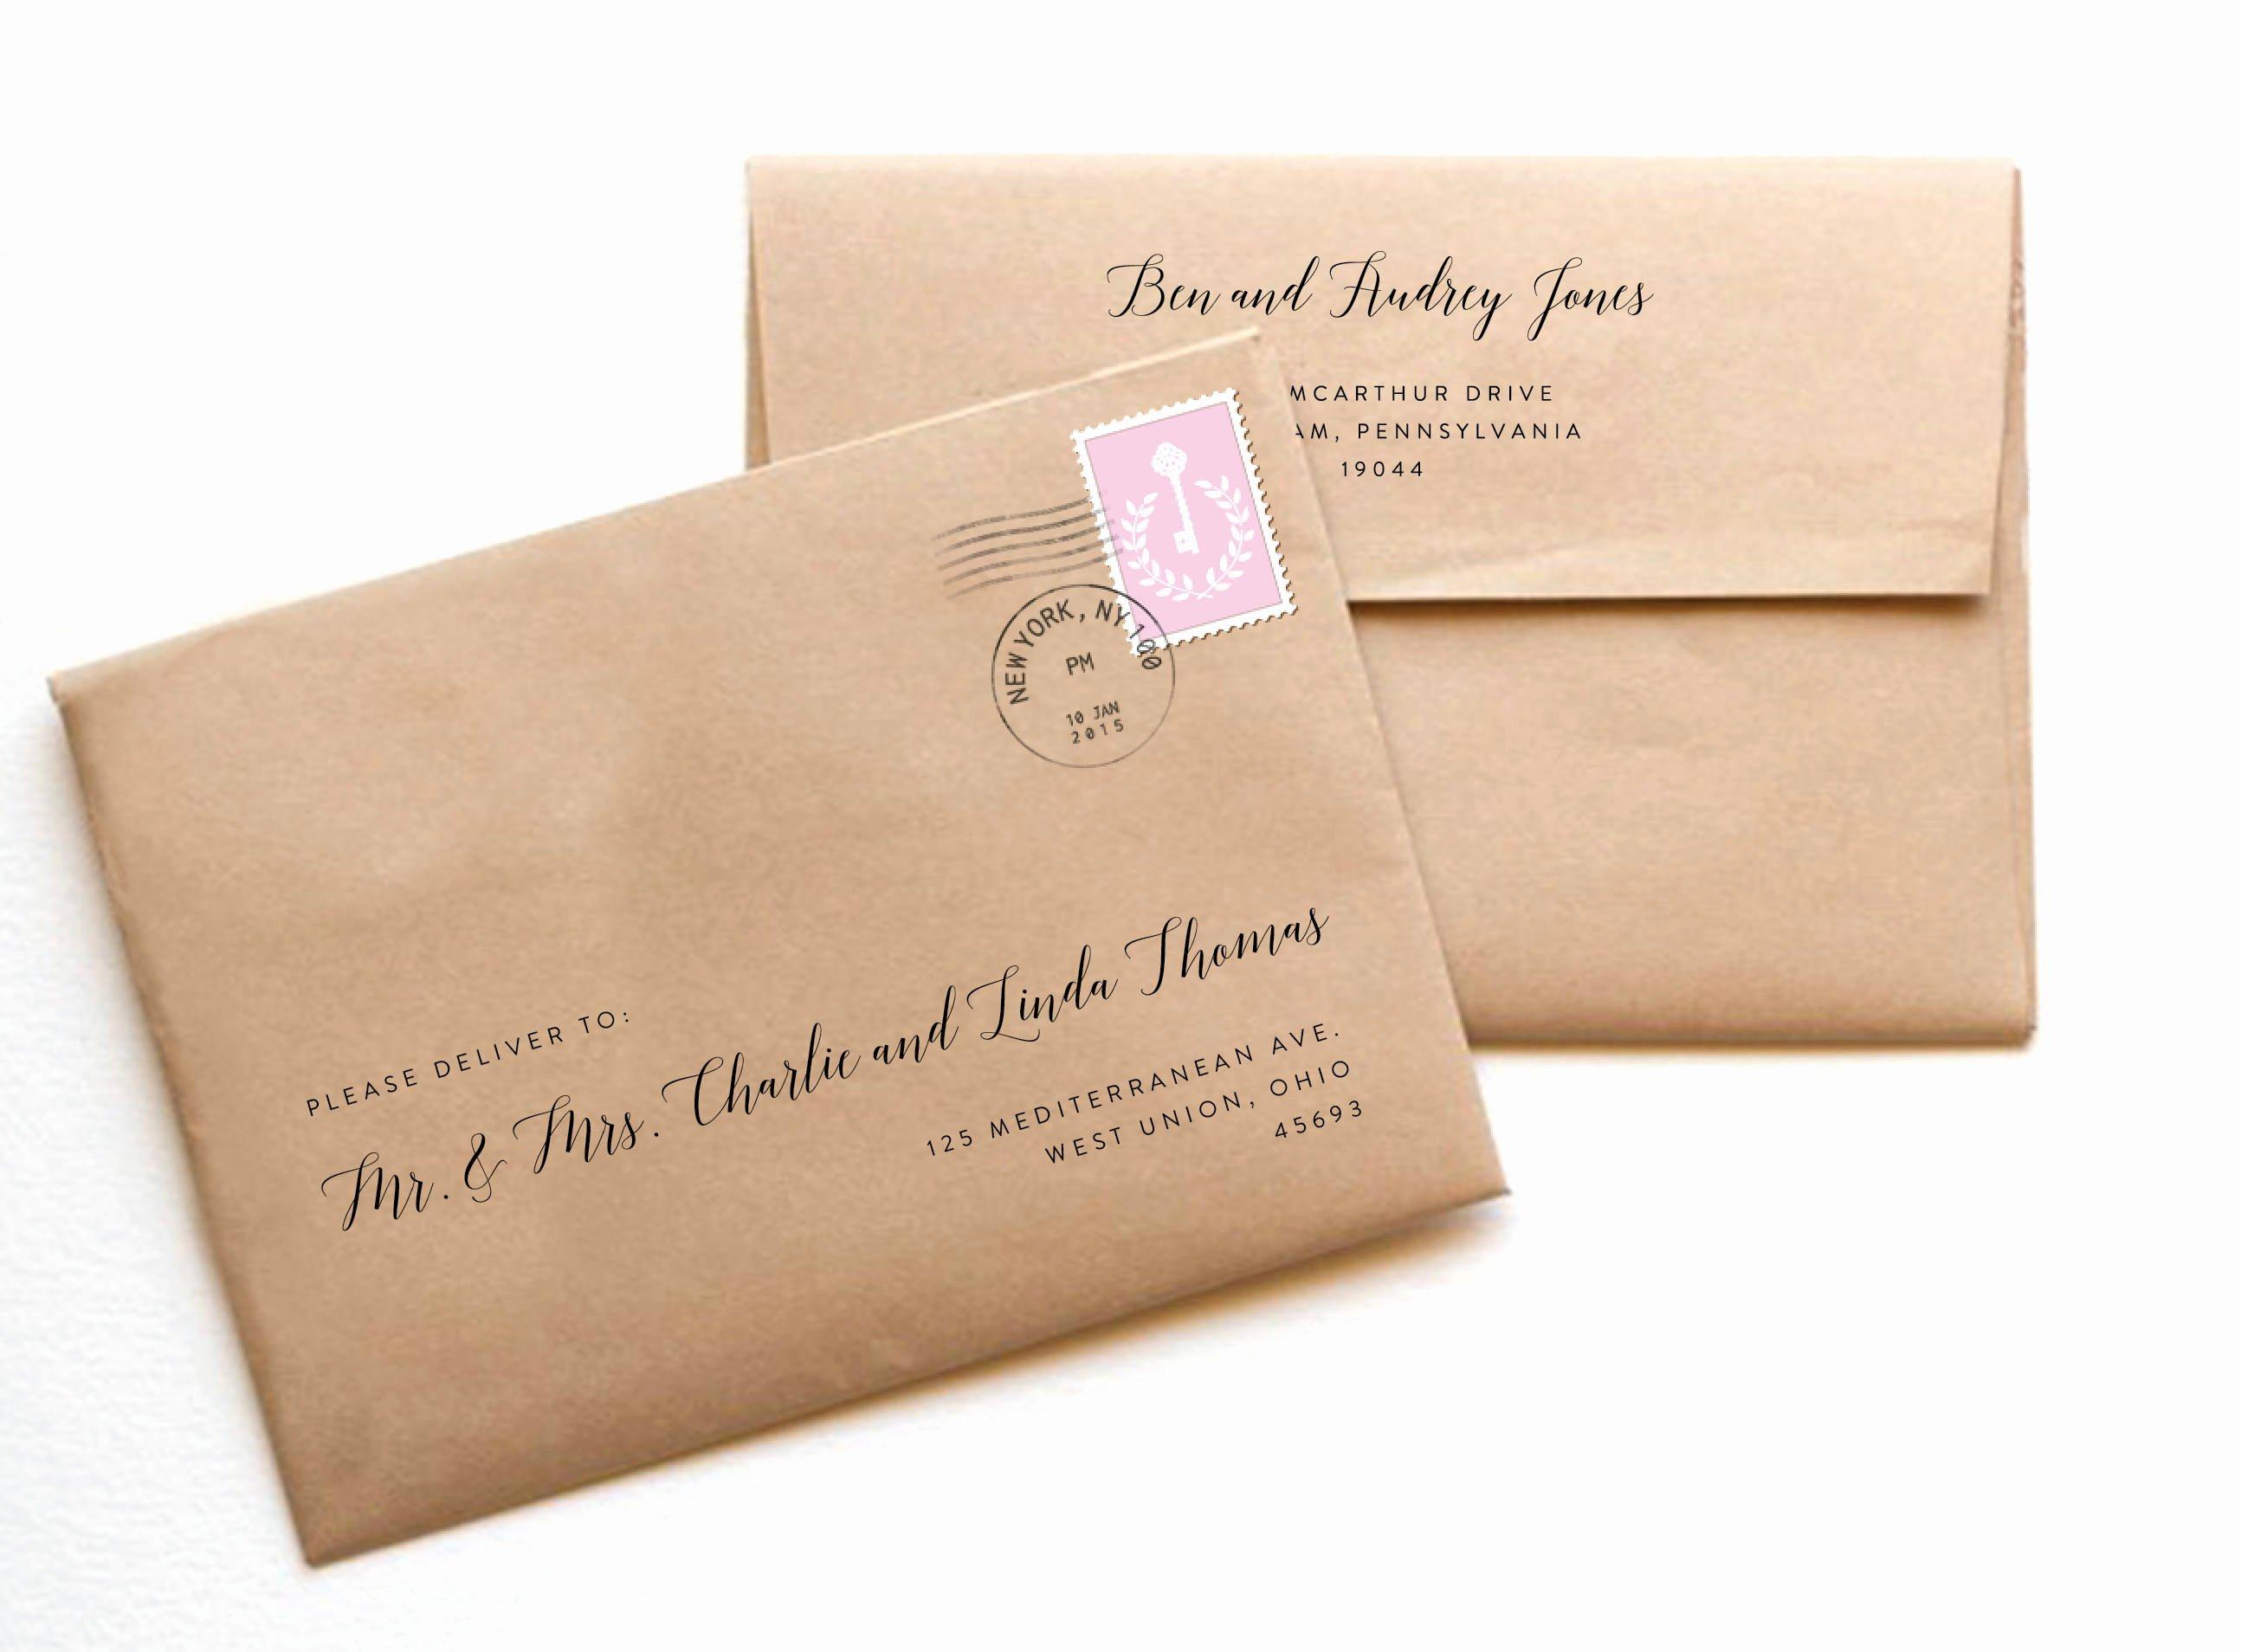 Wedding Envelope Address Template Unique Wedding Envelopes Envelope Template Printable Envelope